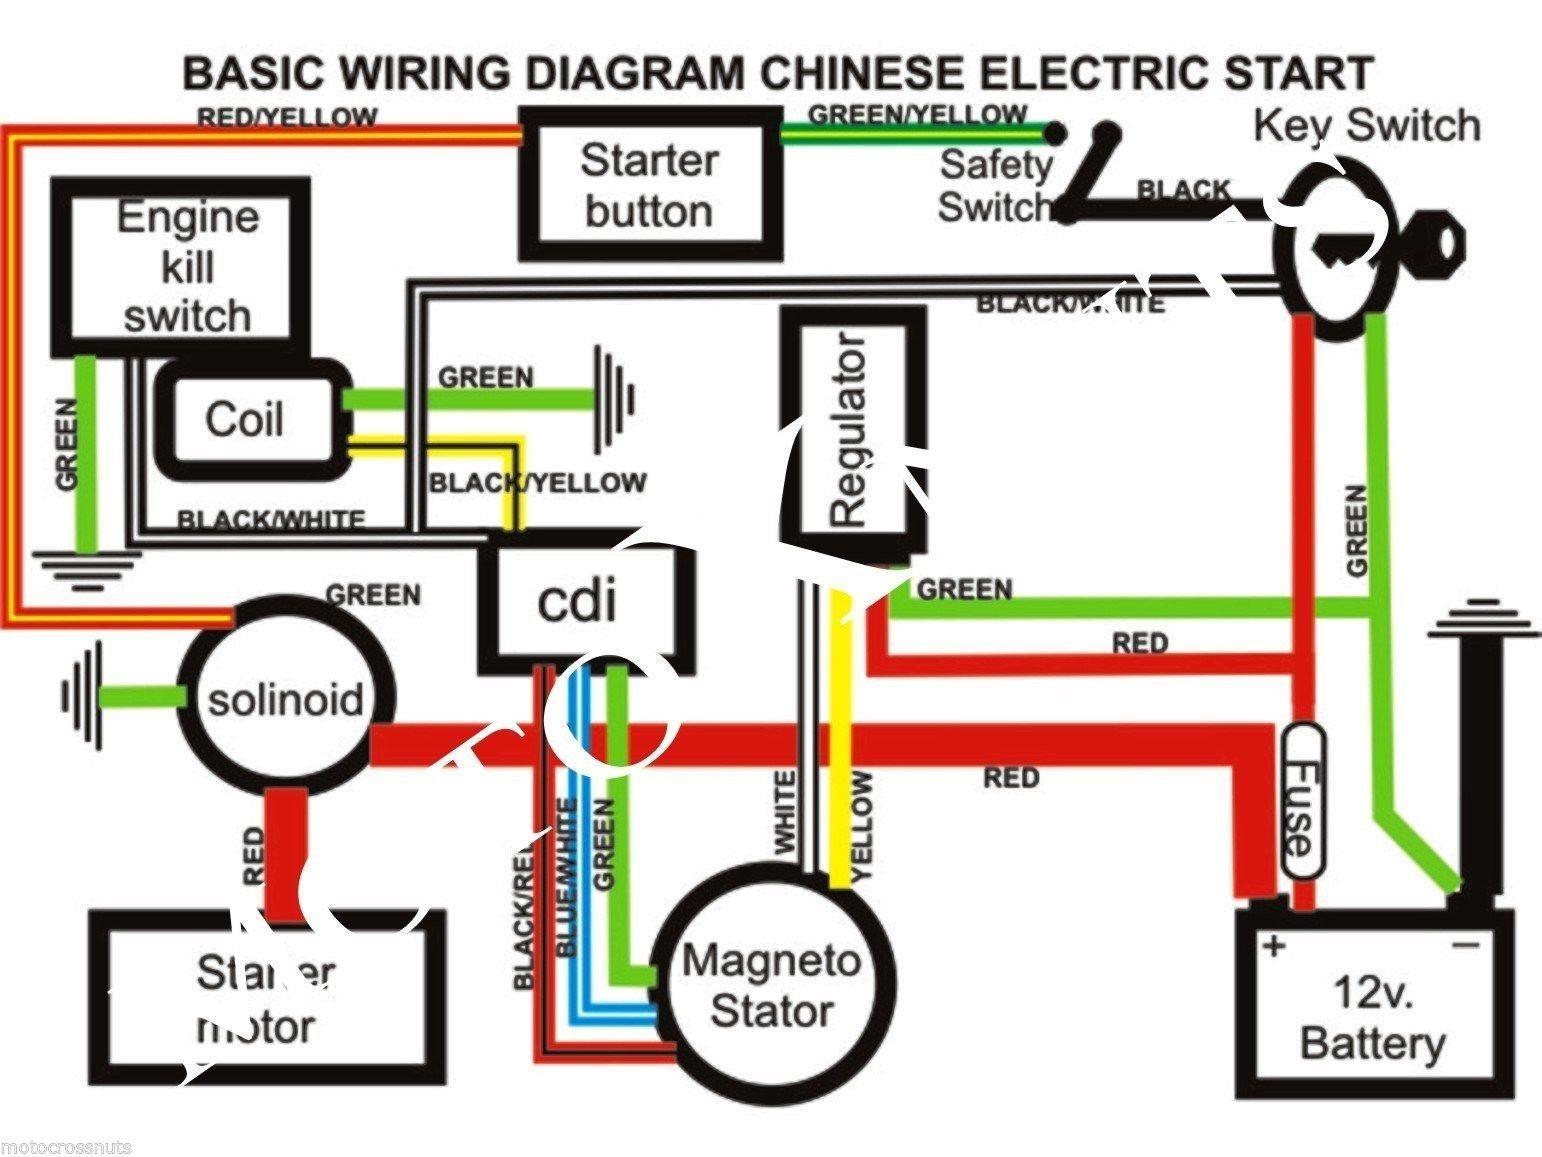 Wonderful 10 best collection kawasaki bayou 220 wiring diagram fantastic kawasaki bayou 220 wiring harness diagram photos swarovskicordoba Choice Image